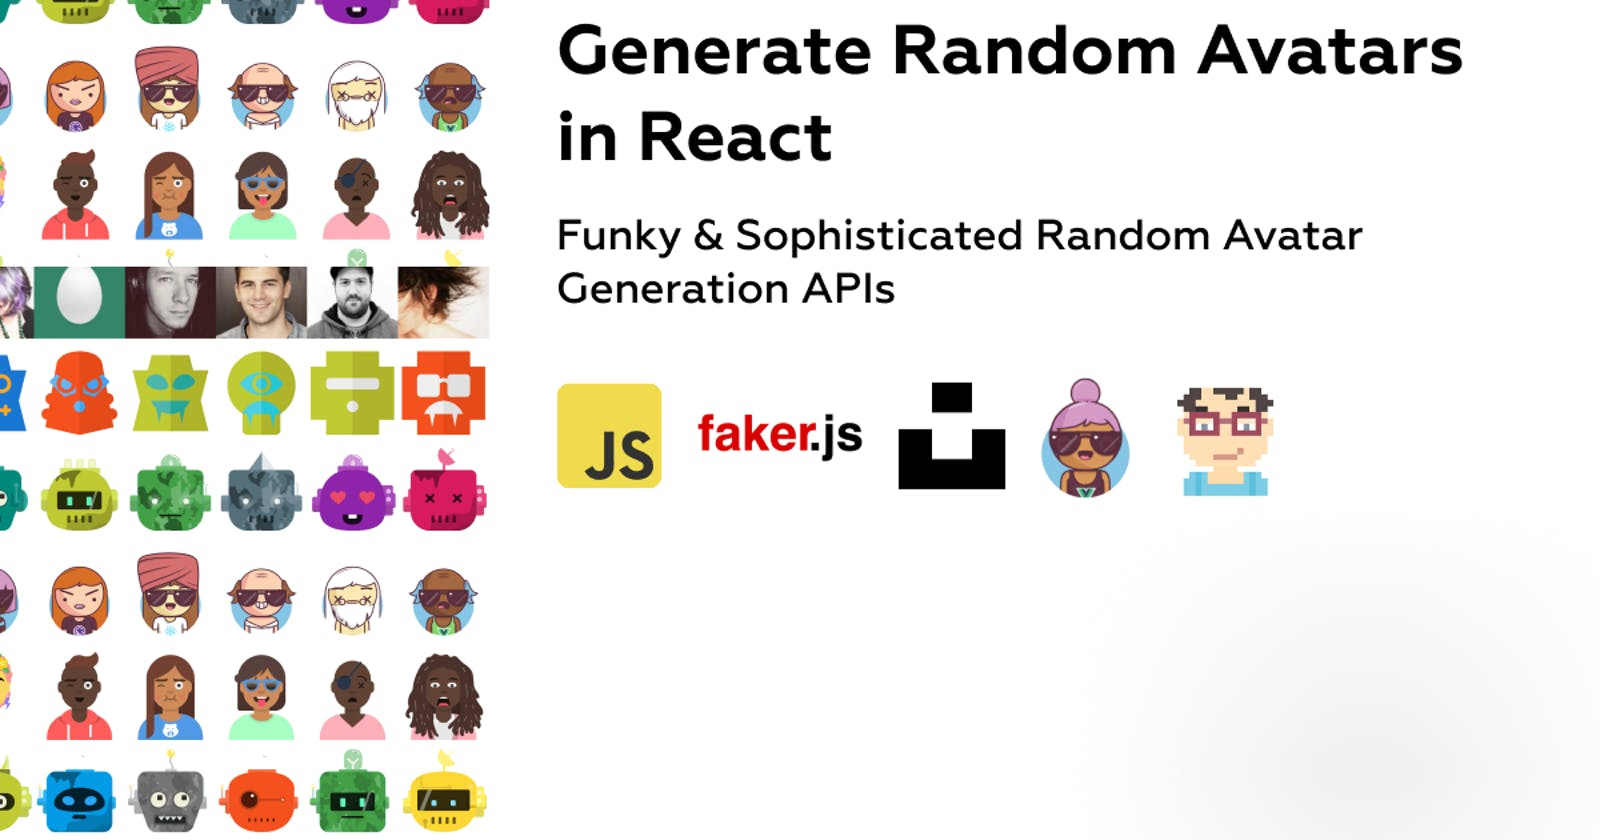 Generate Random Avatars in React